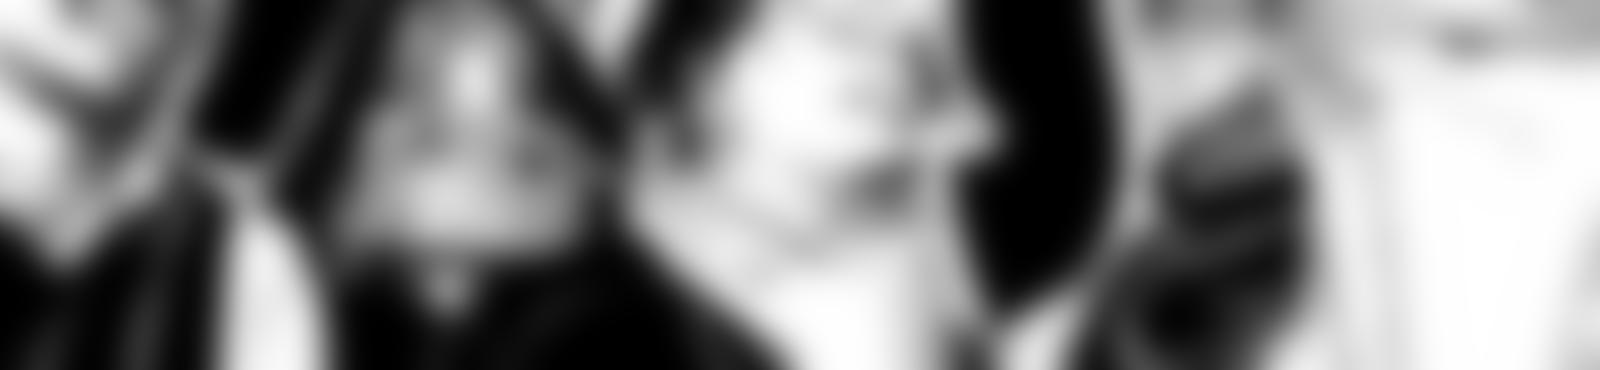 Blurred cfaadc58 1f80 4fa1 8d2c 41c65e1a371e